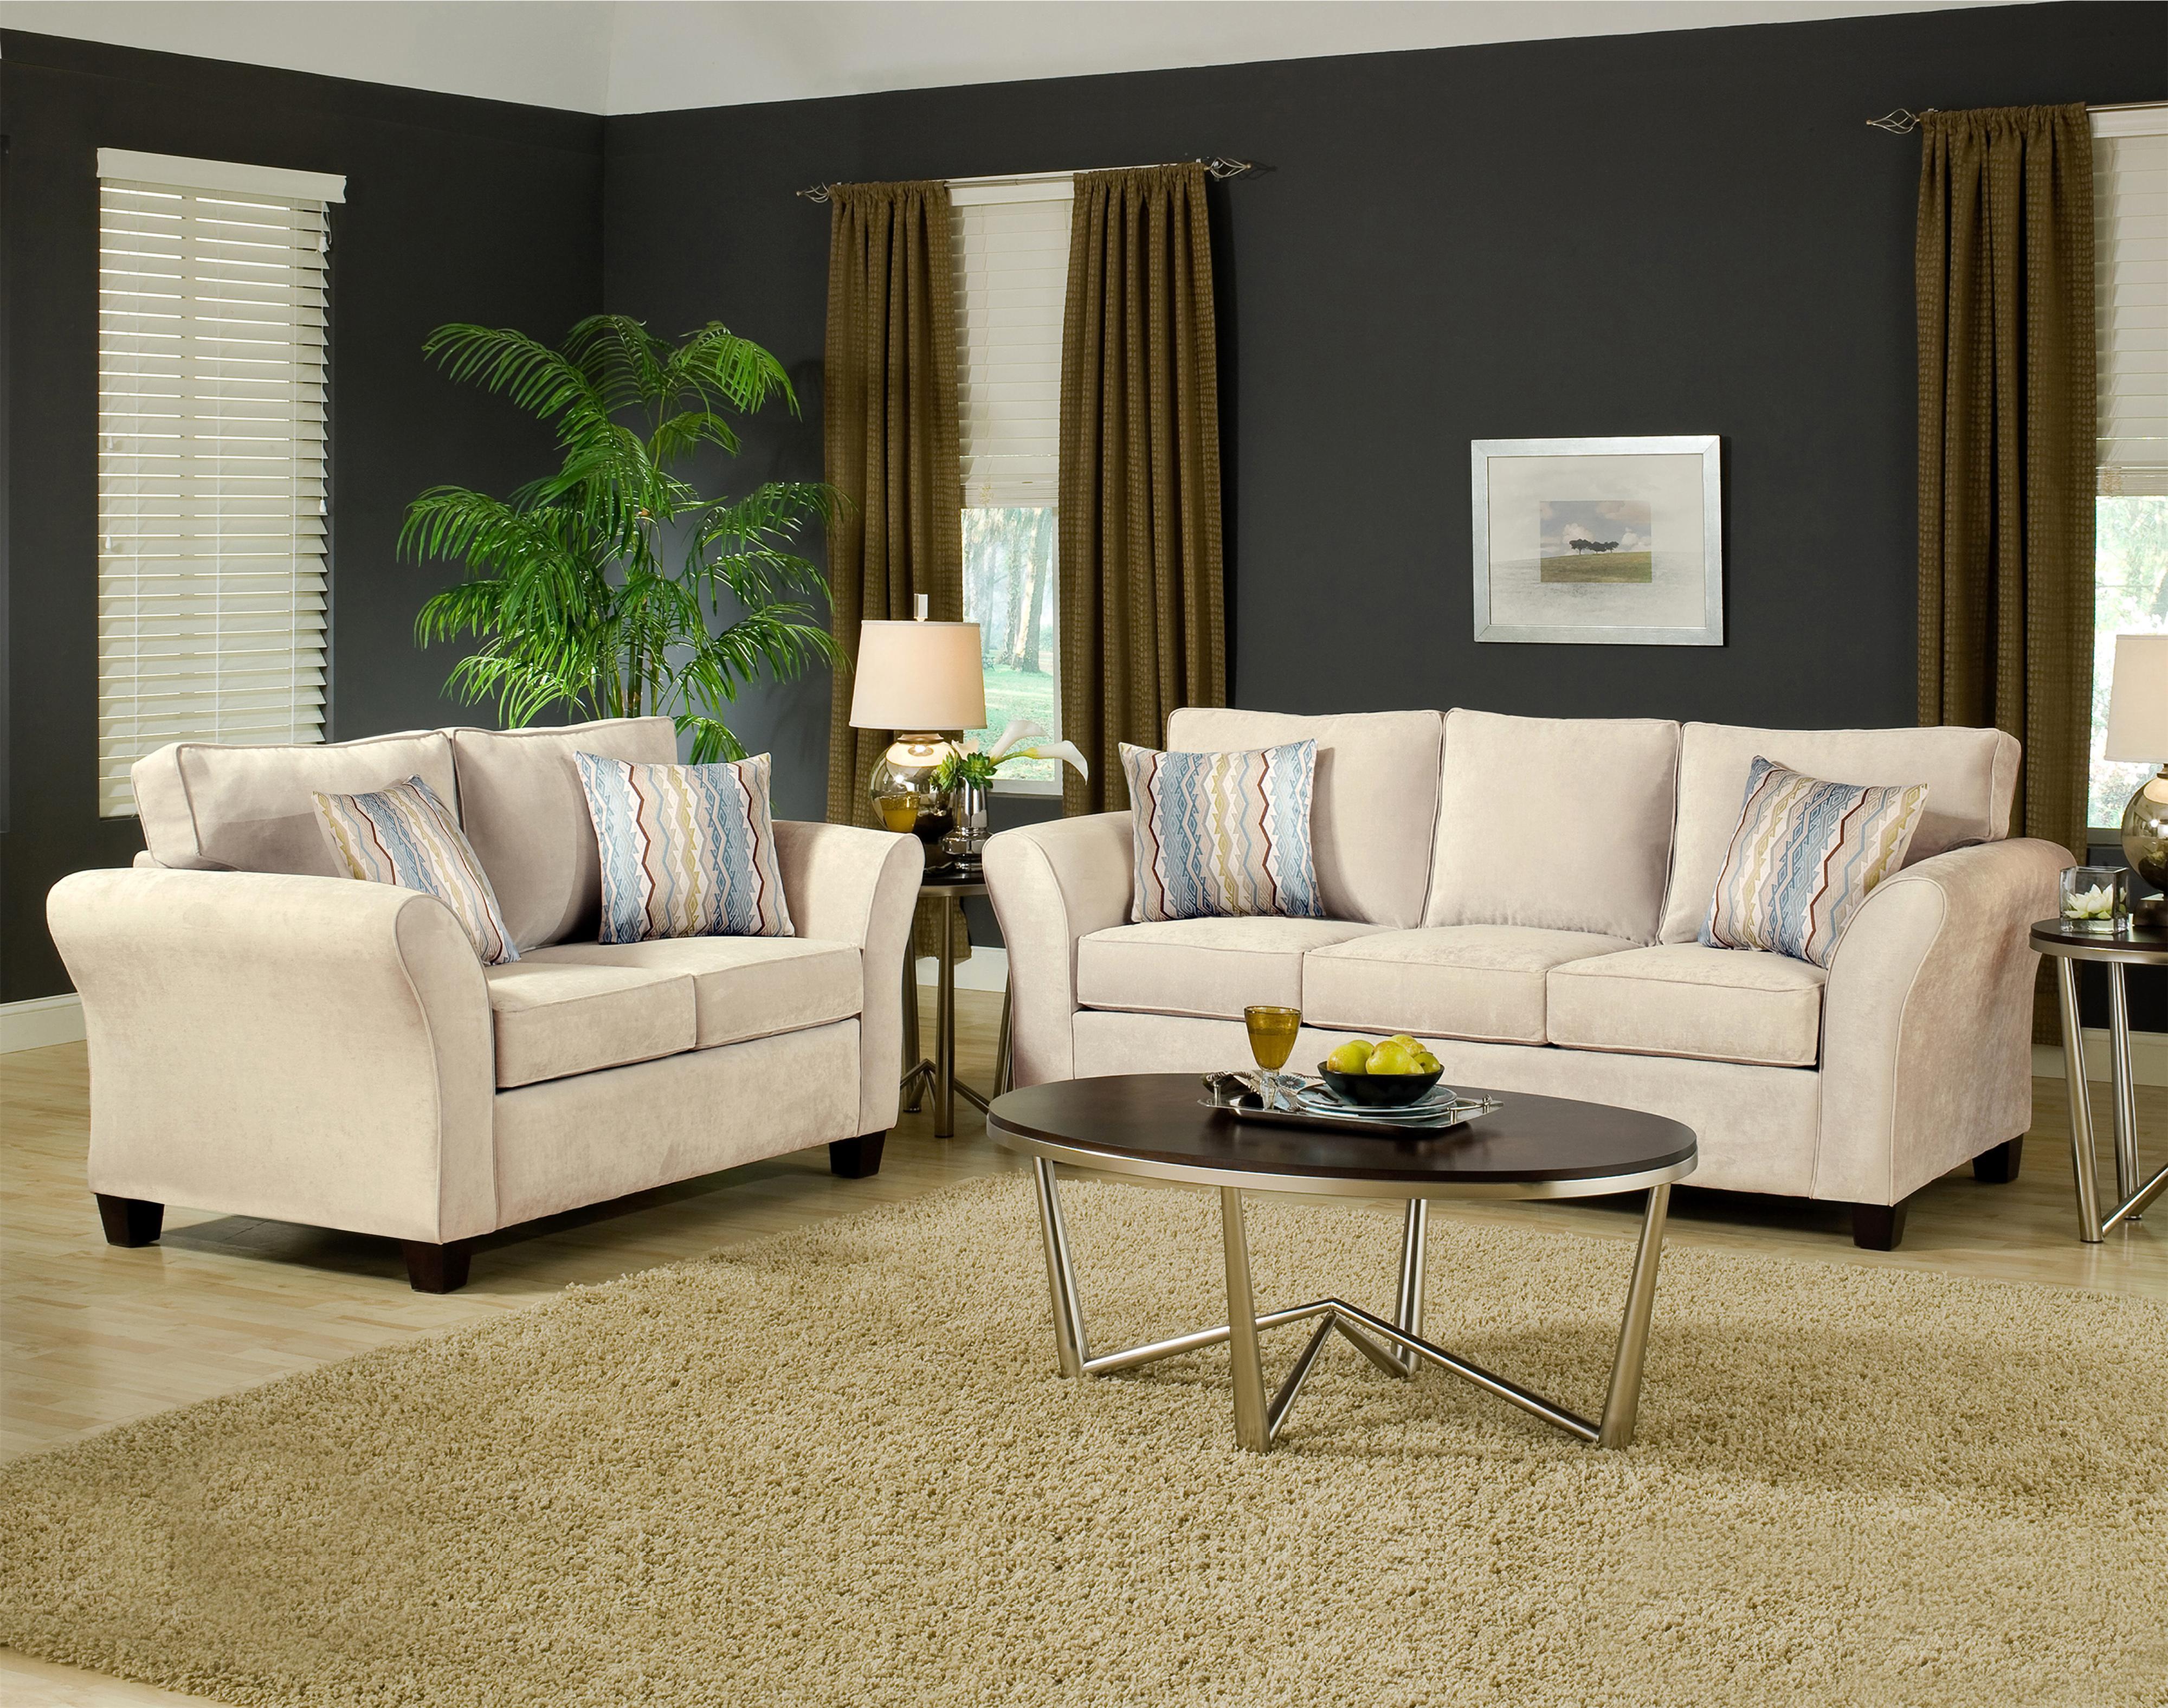 Addison 8400 Stationary Living Room Group by VFM Essentials at Virginia Furniture Market